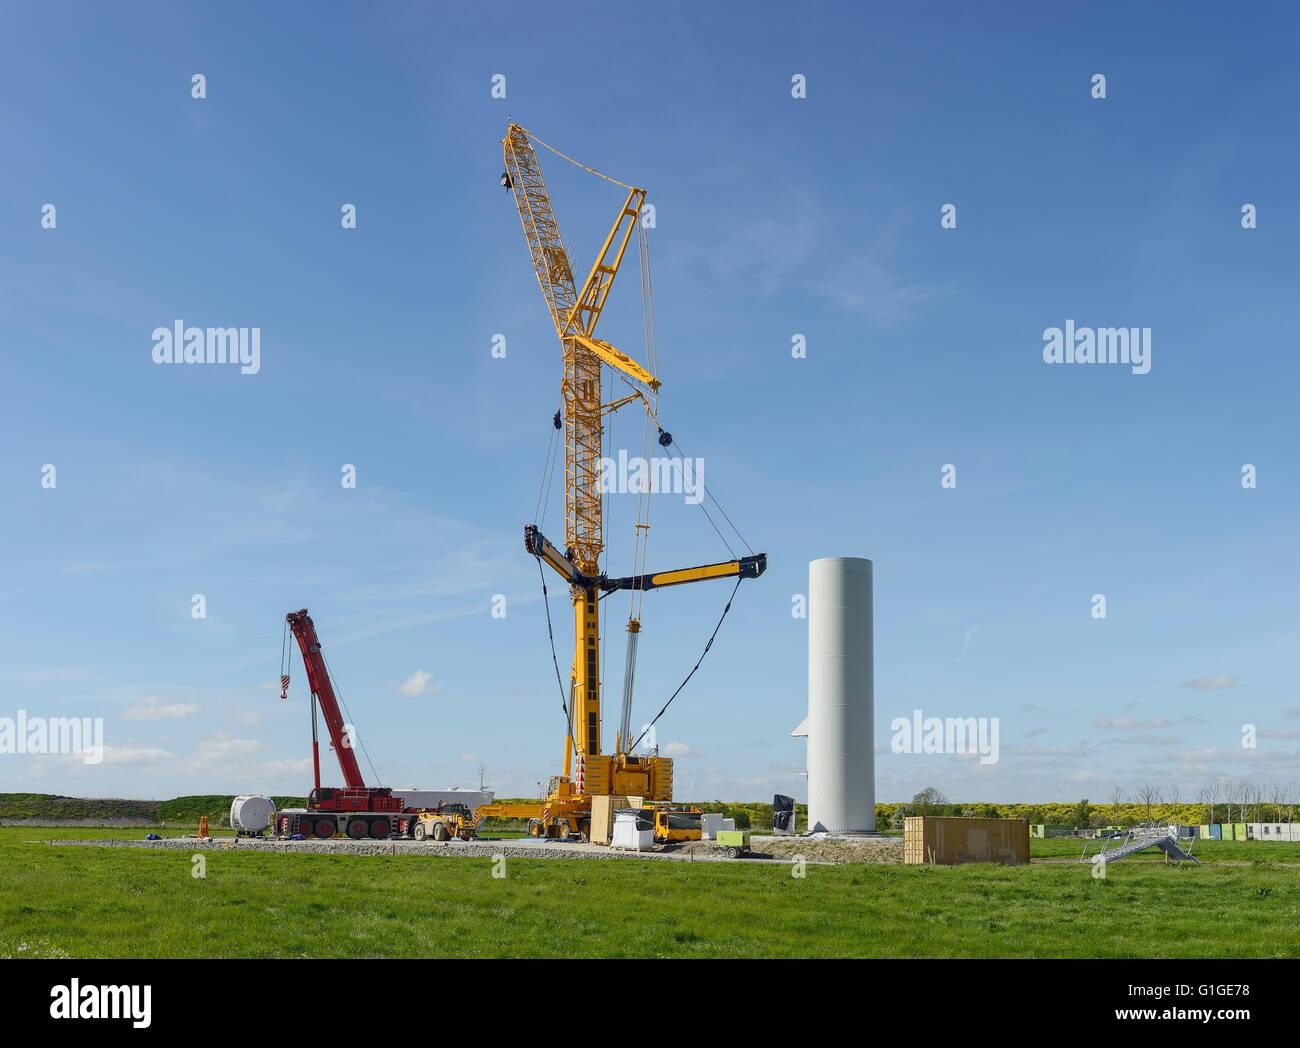 Bau einer Windkraftanlage im Windpark Frodsham, Cheshire UK Stockbild